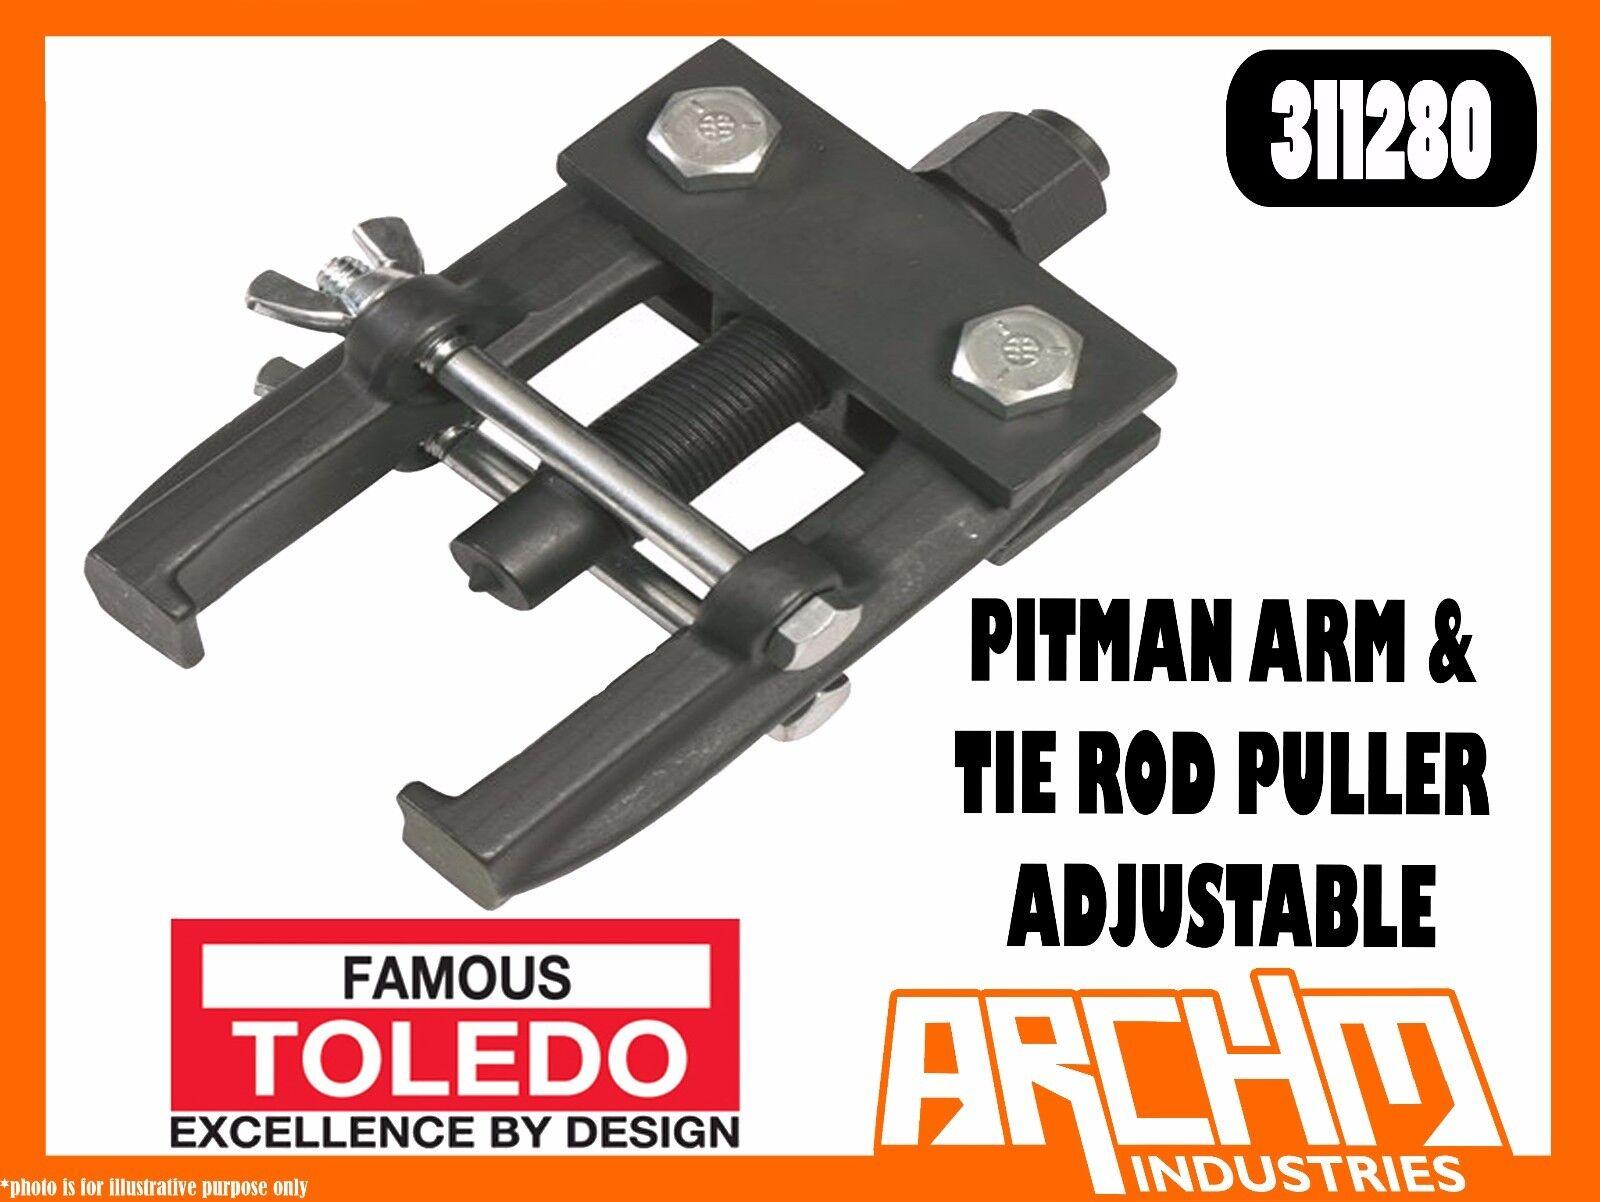 TOLEDO 311280 - PITMAN ARM & TIE ROD PULLER ADJUSTABLE - REMOVAL STEEL DURABLE